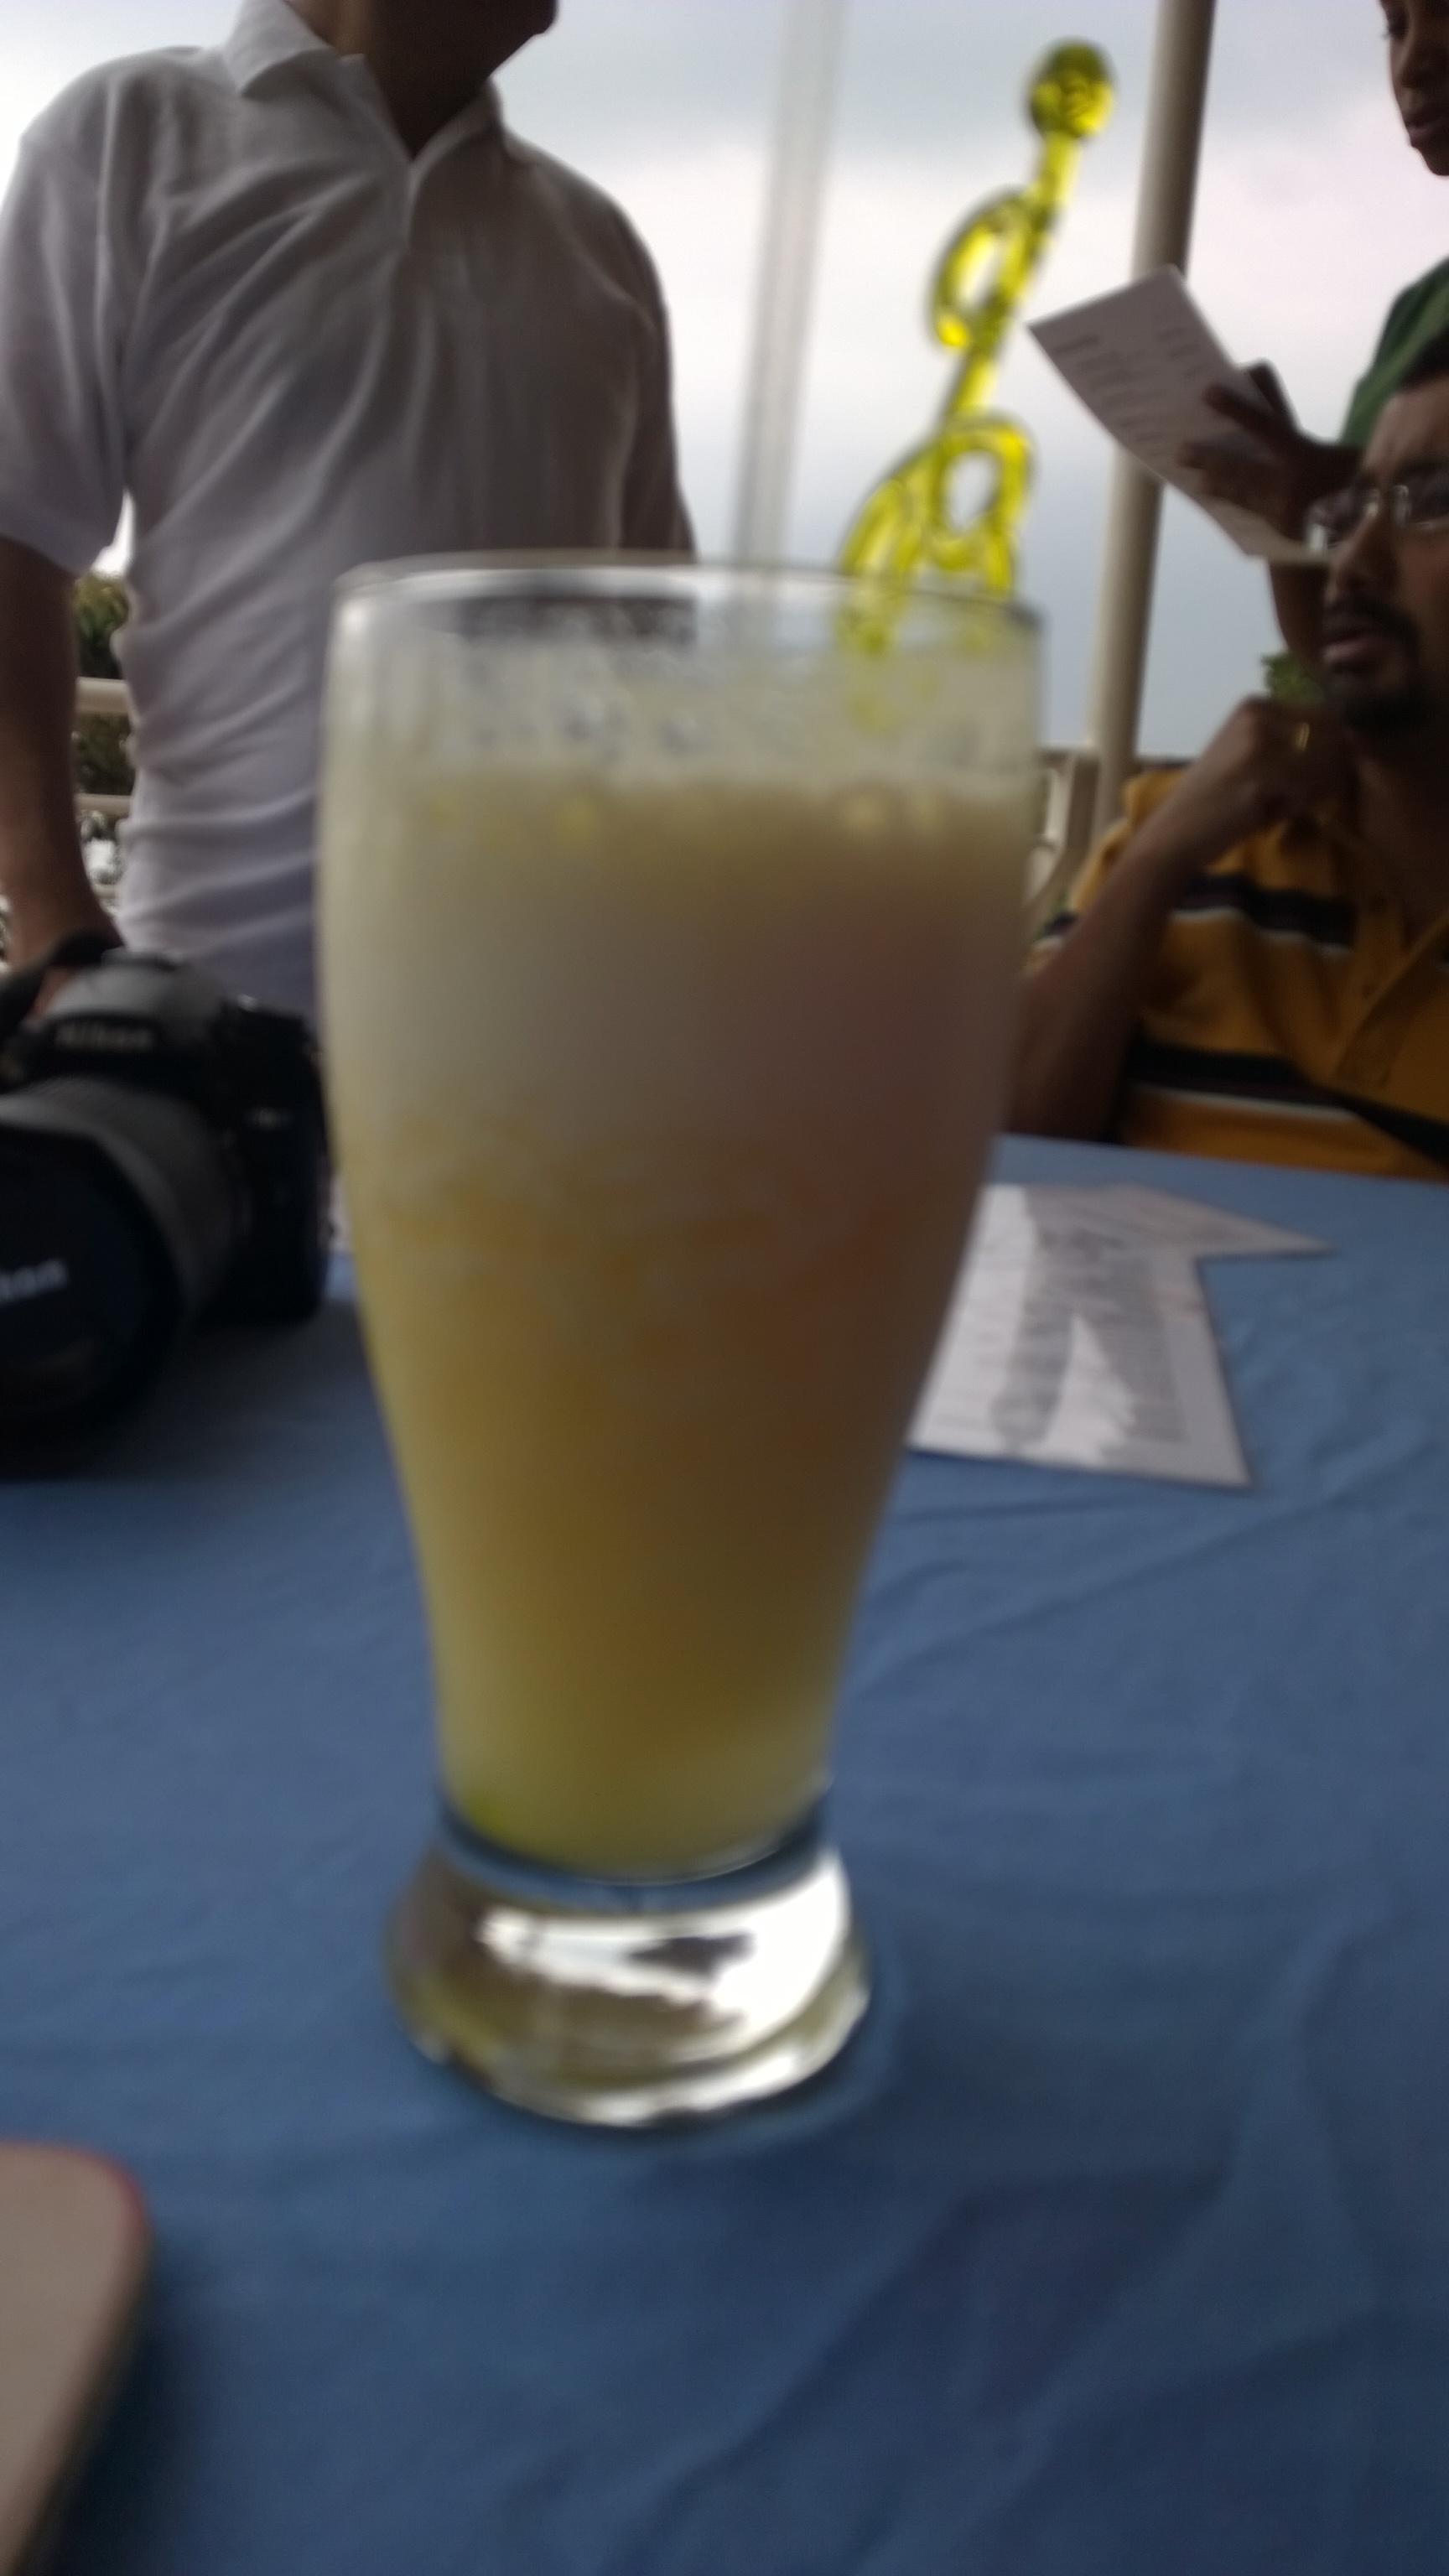 Restaurant Review: White Rock Bistro in Gisenyi, Rwanda